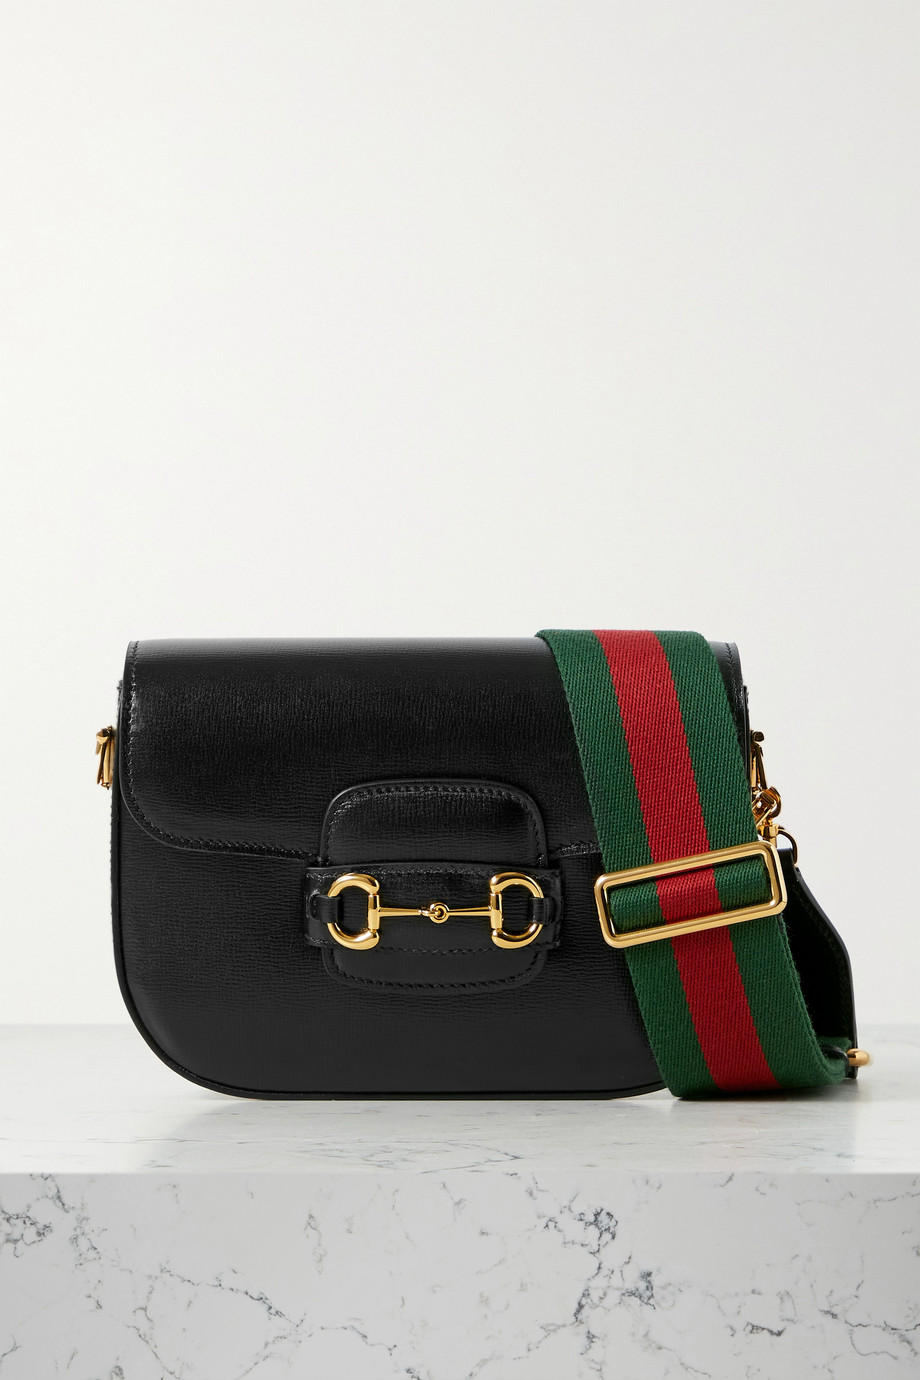 Gucci Horsebit 1955 Schultertasche aus strukturiertem Leder